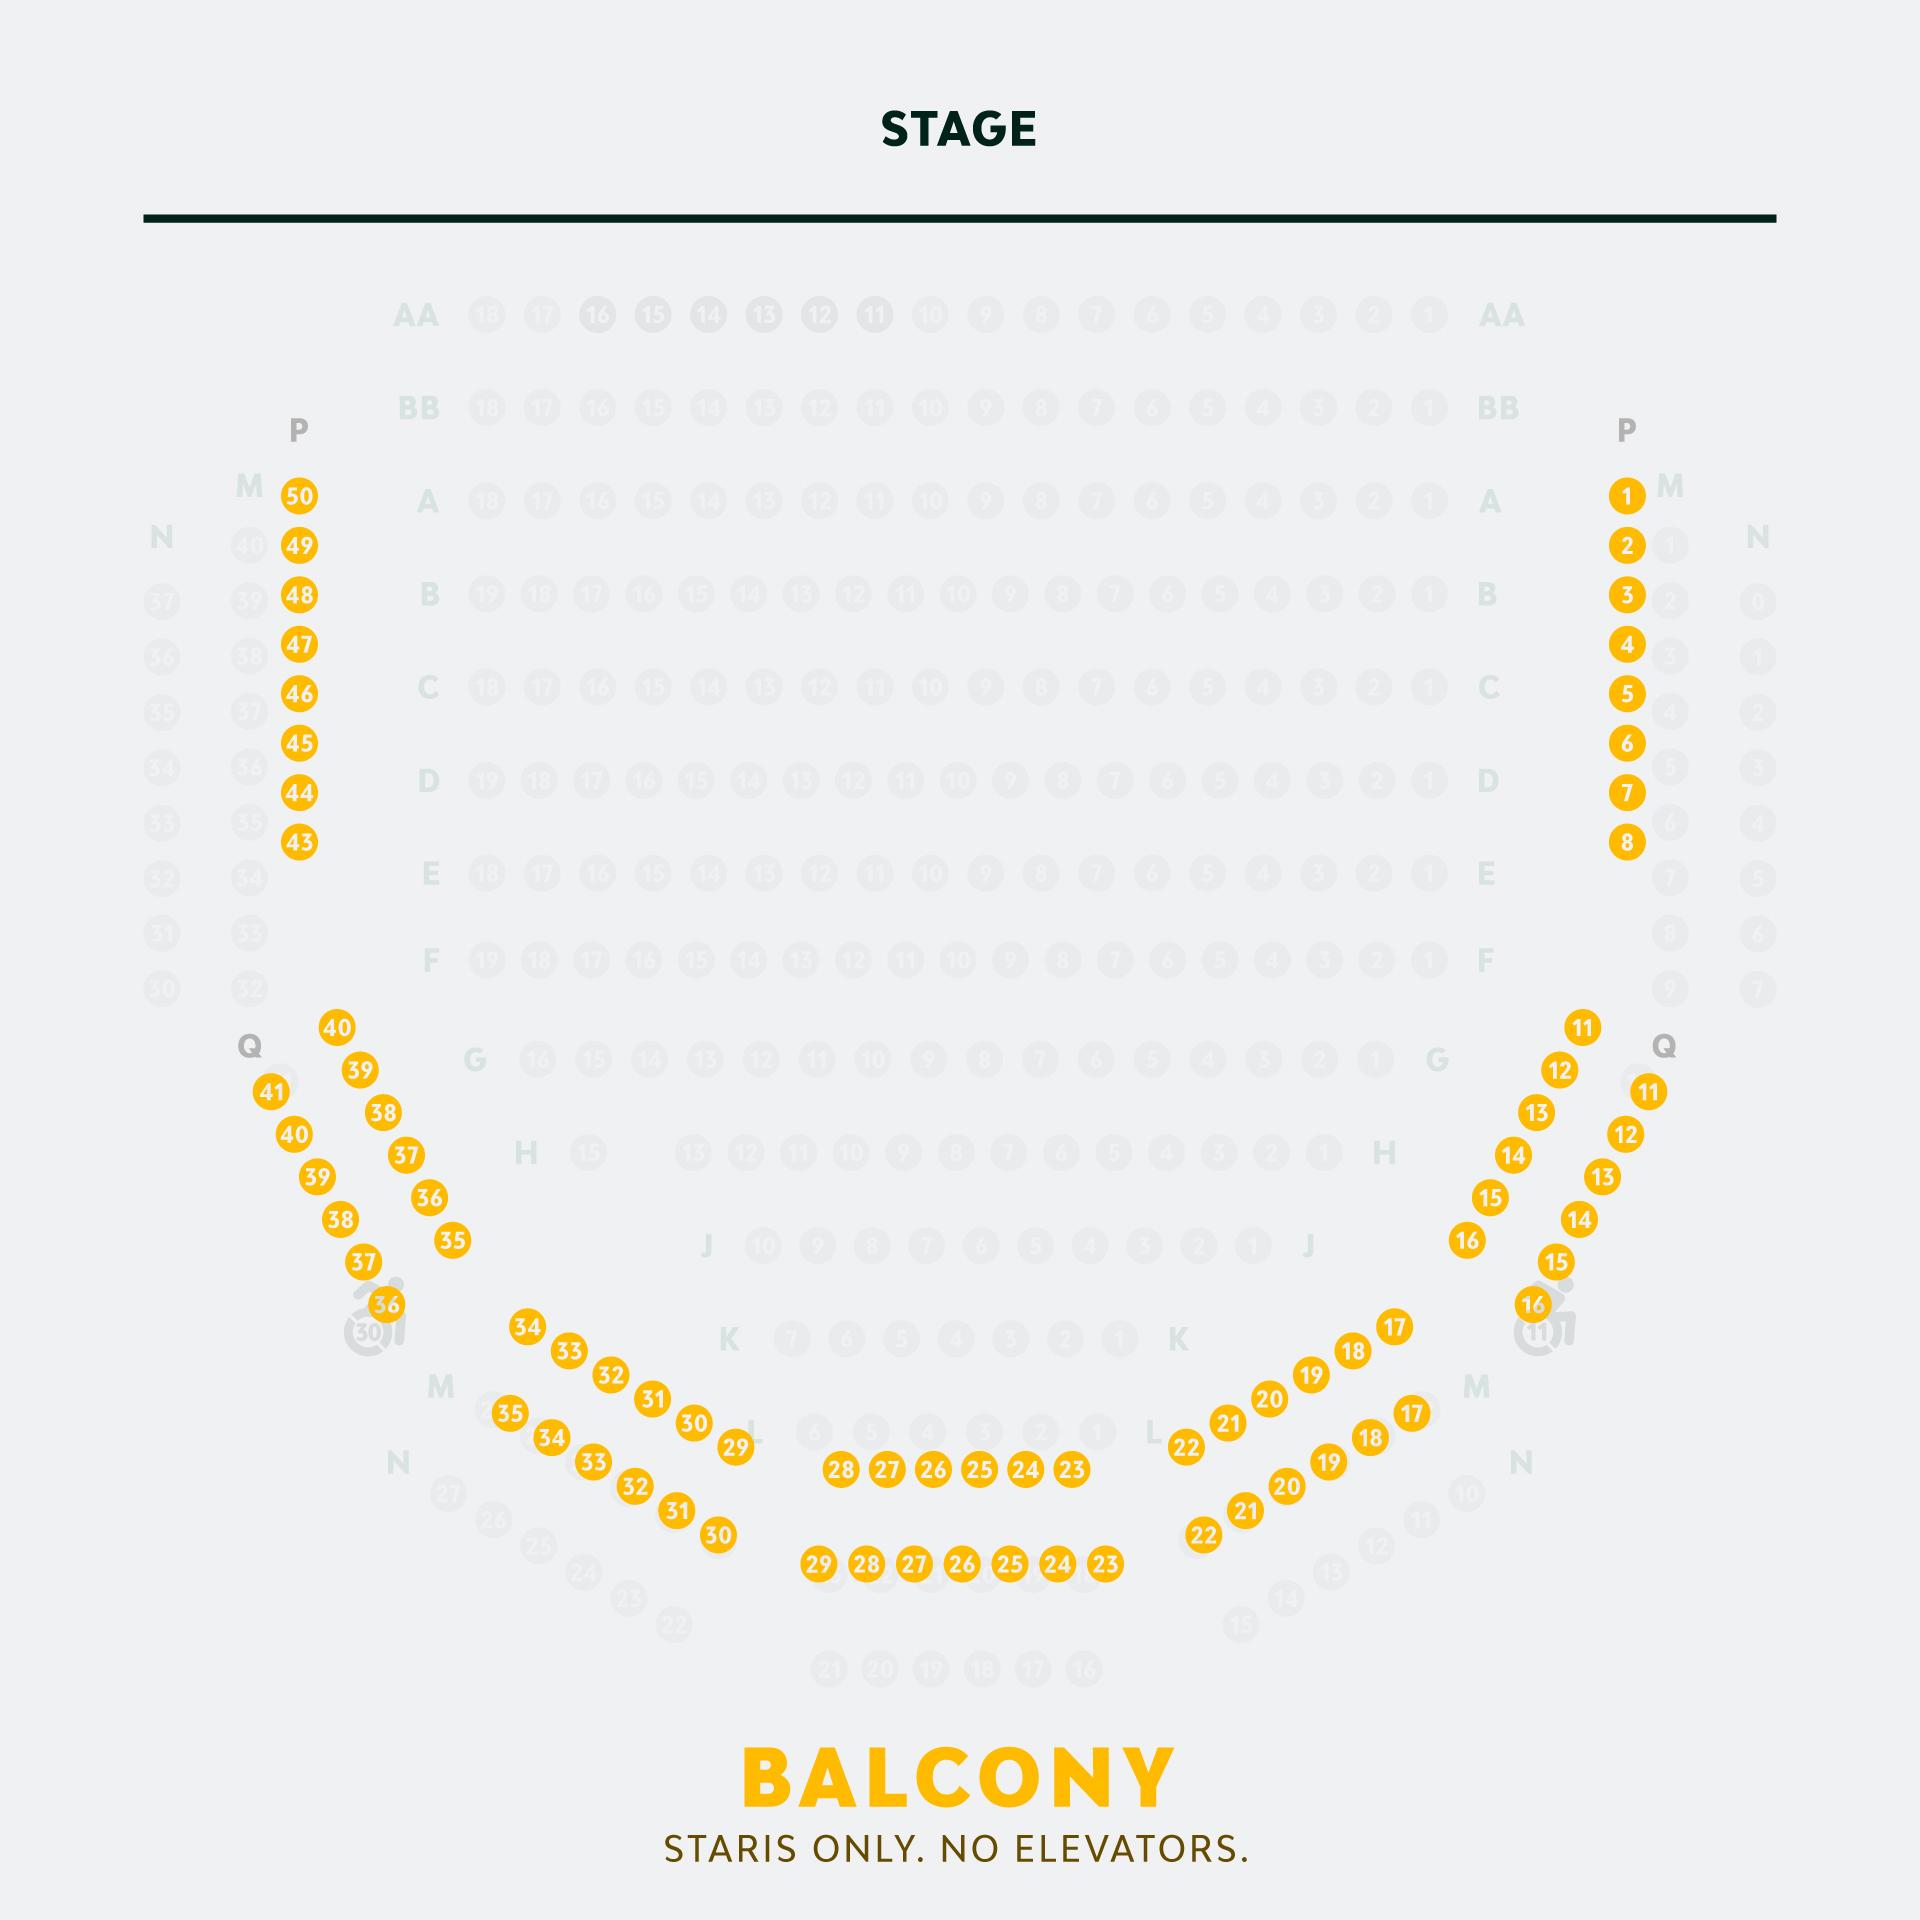 Elizabeth Wallace Theater Balcony Seating